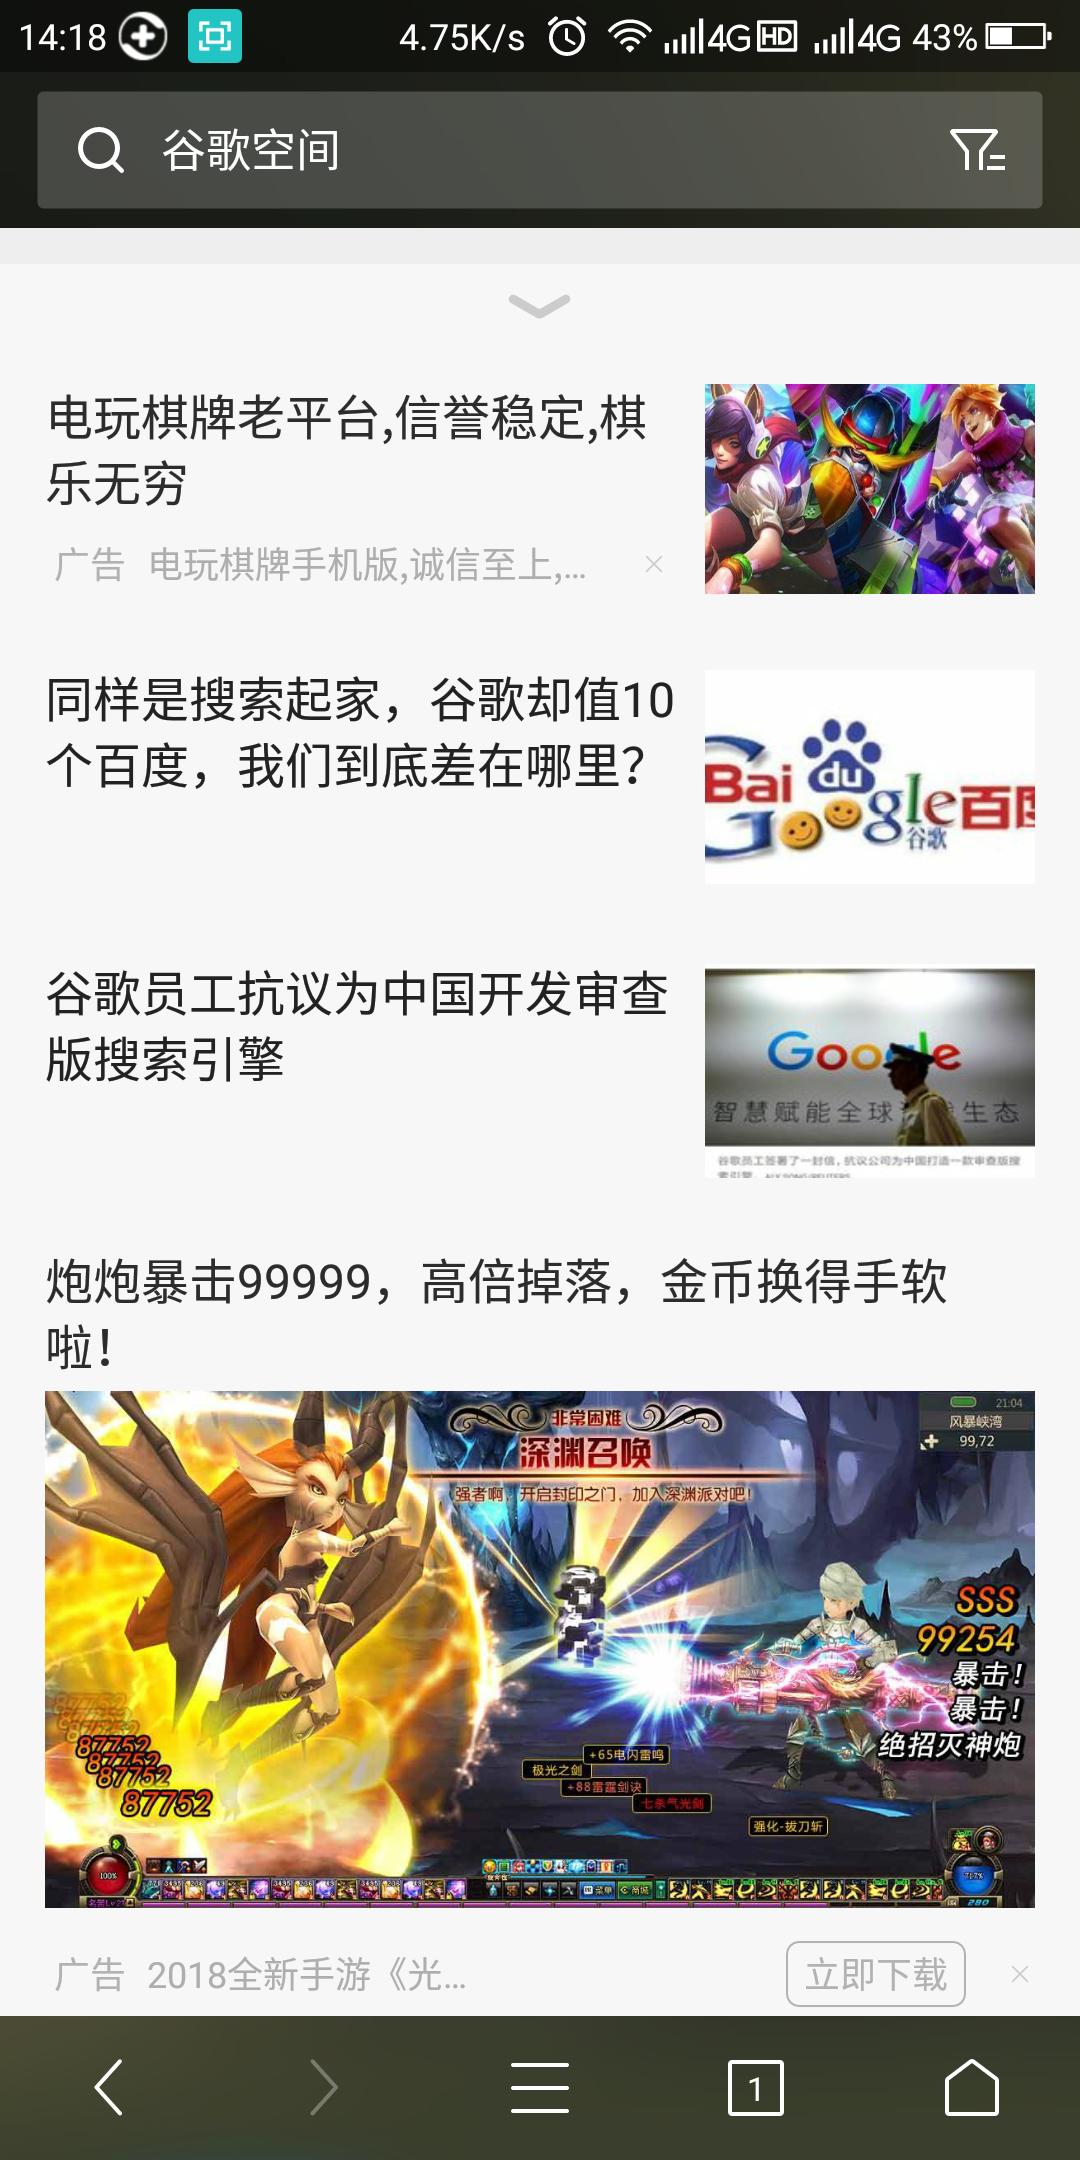 Screenshot_2018-10-27-14-18-06.png